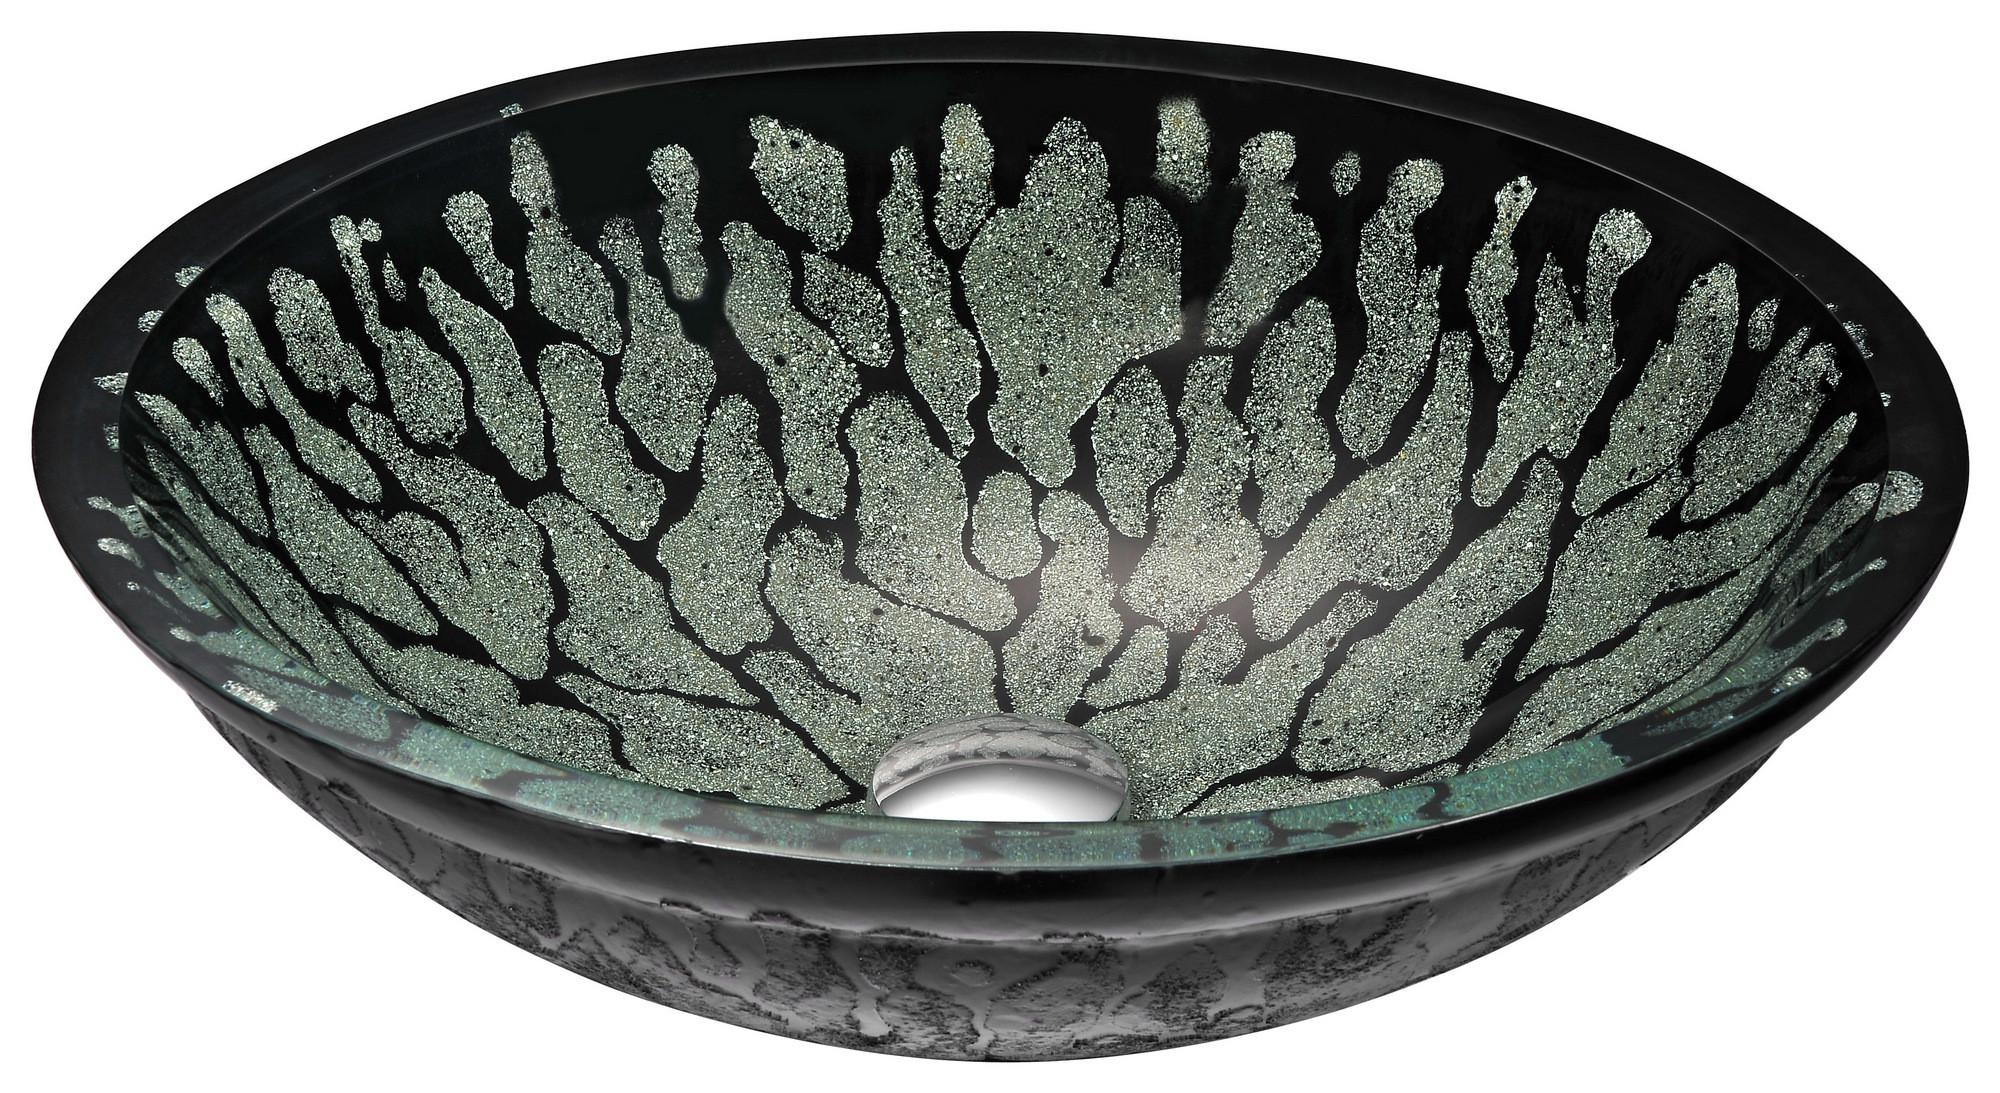 ANZZI LS-AZ043 Bravo Series Deco-Glass Vessel Sink In Lustrous Black